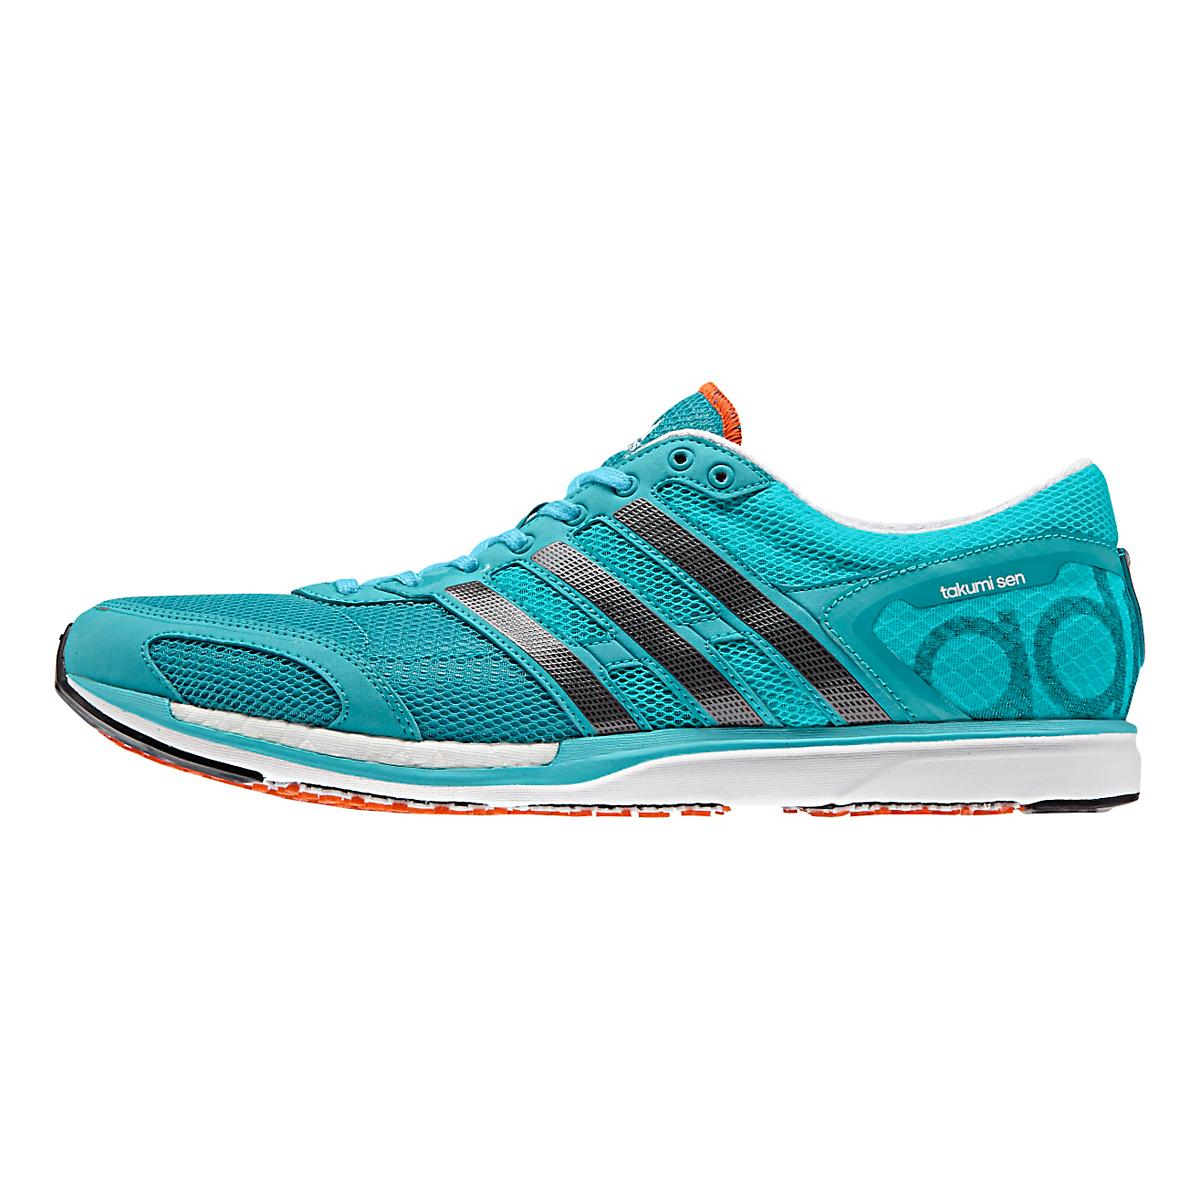 online store 4fedf 98828 adidas Adizero Takumi-Sen 3 Boost Racing Shoe at Road Runner